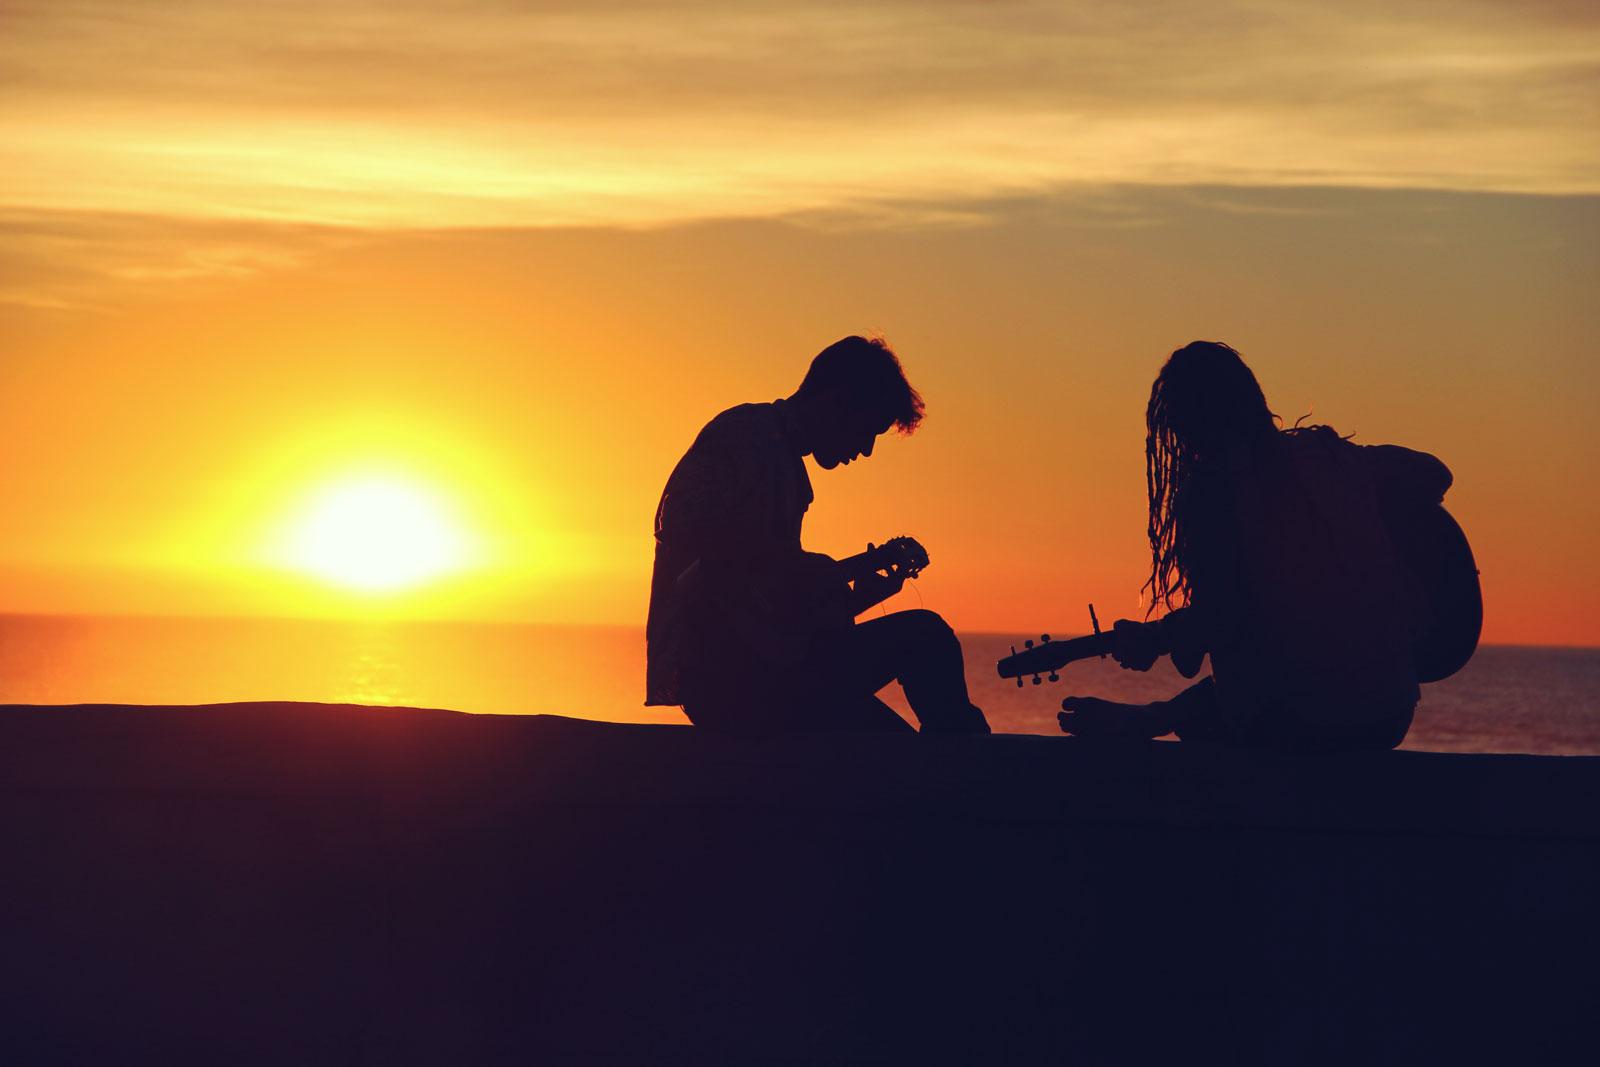 Playing Guitar Sunset